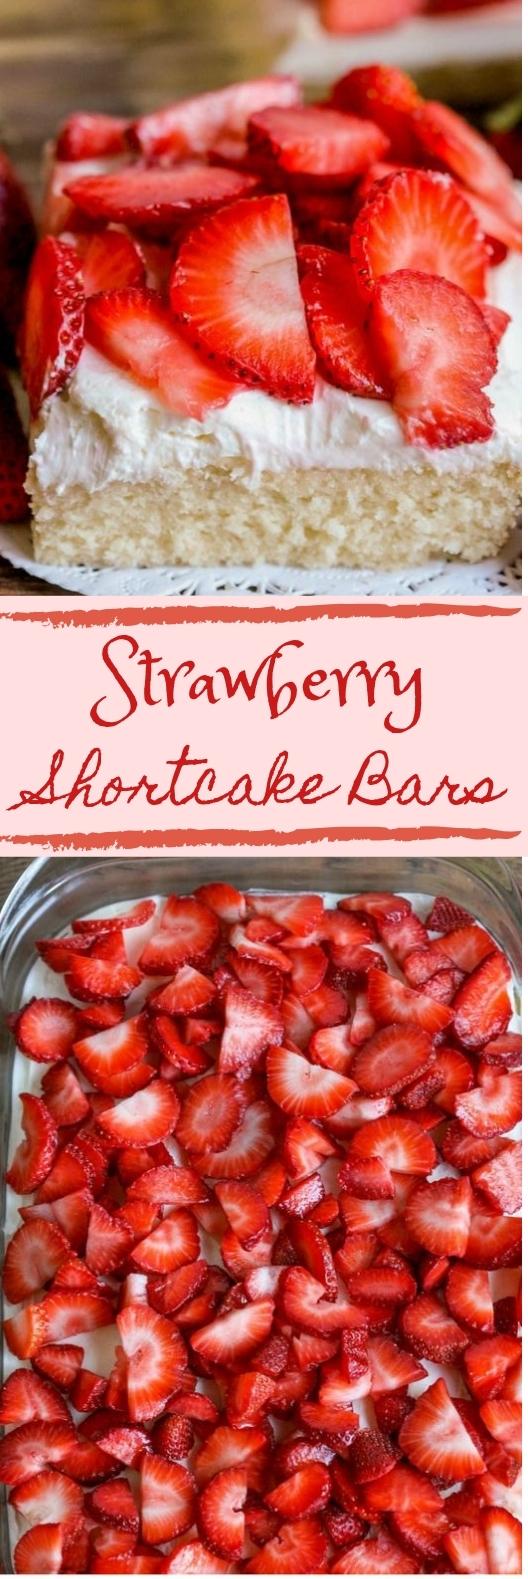 Strawberry Shortcake Bars #dessert #snacks